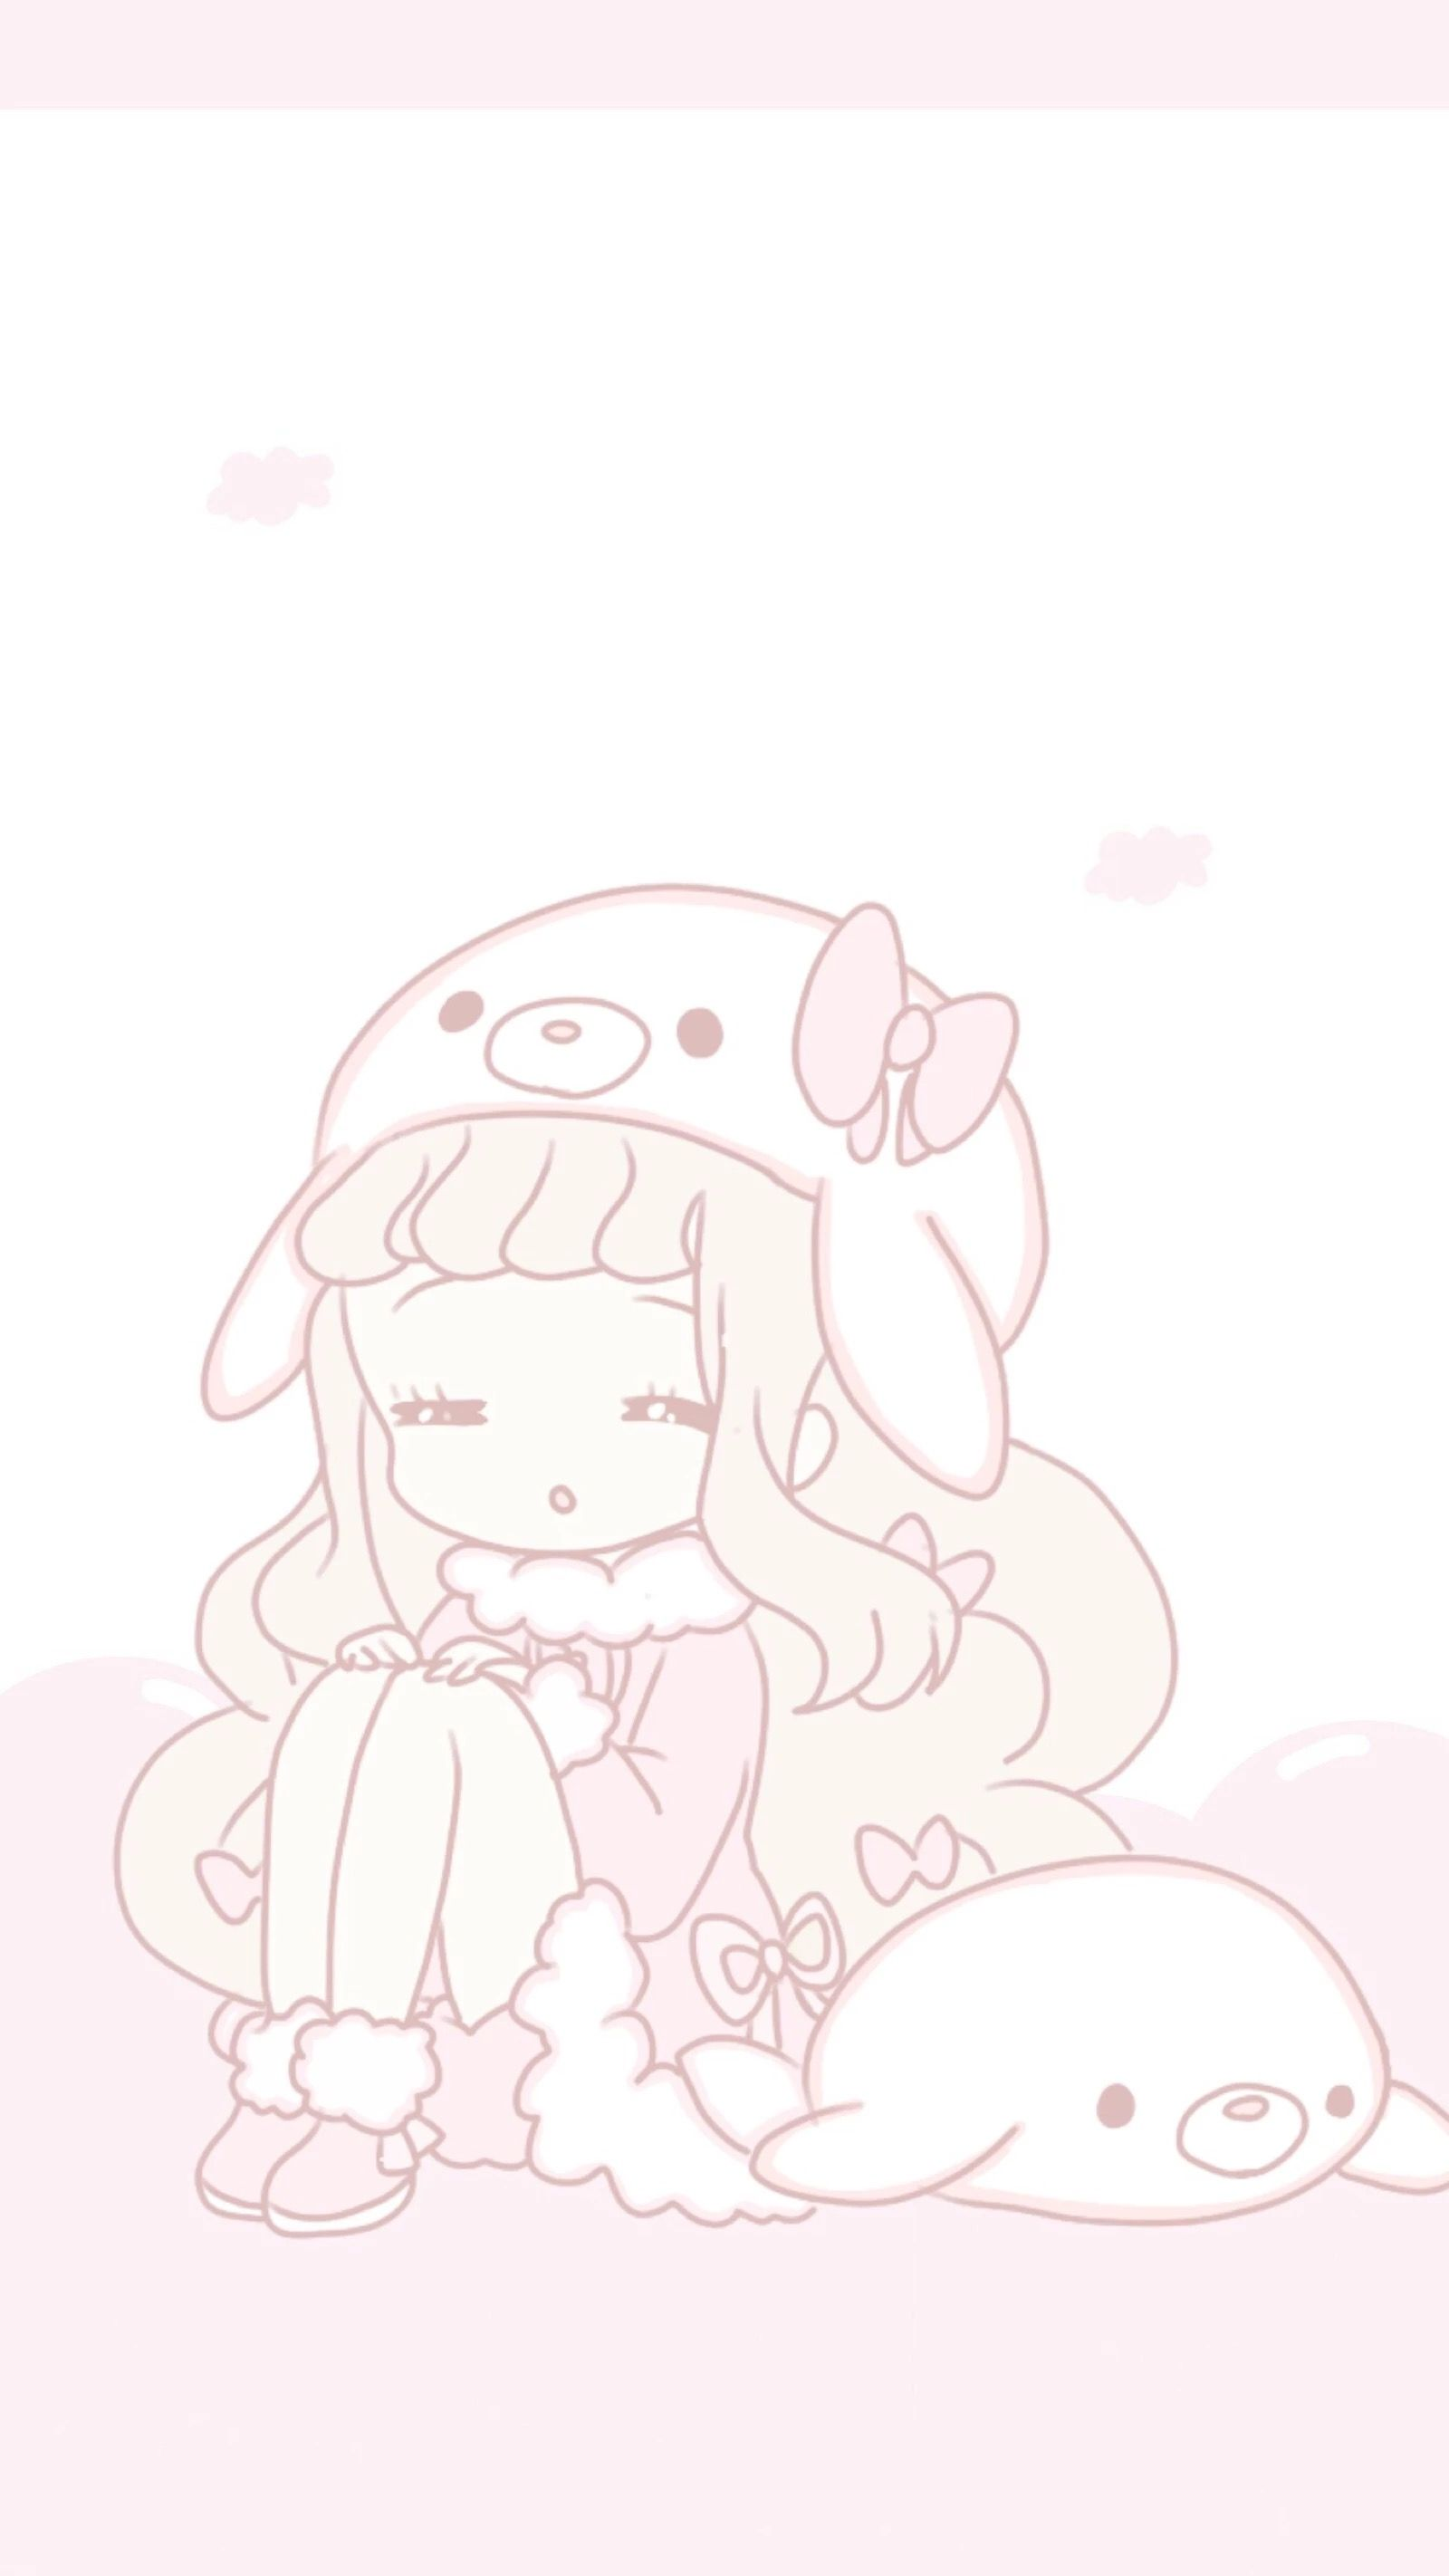 ᎥᏢhσnє Ꮃαllpαpєrѕ Kawaii drawings, Kawaii art, Anime art